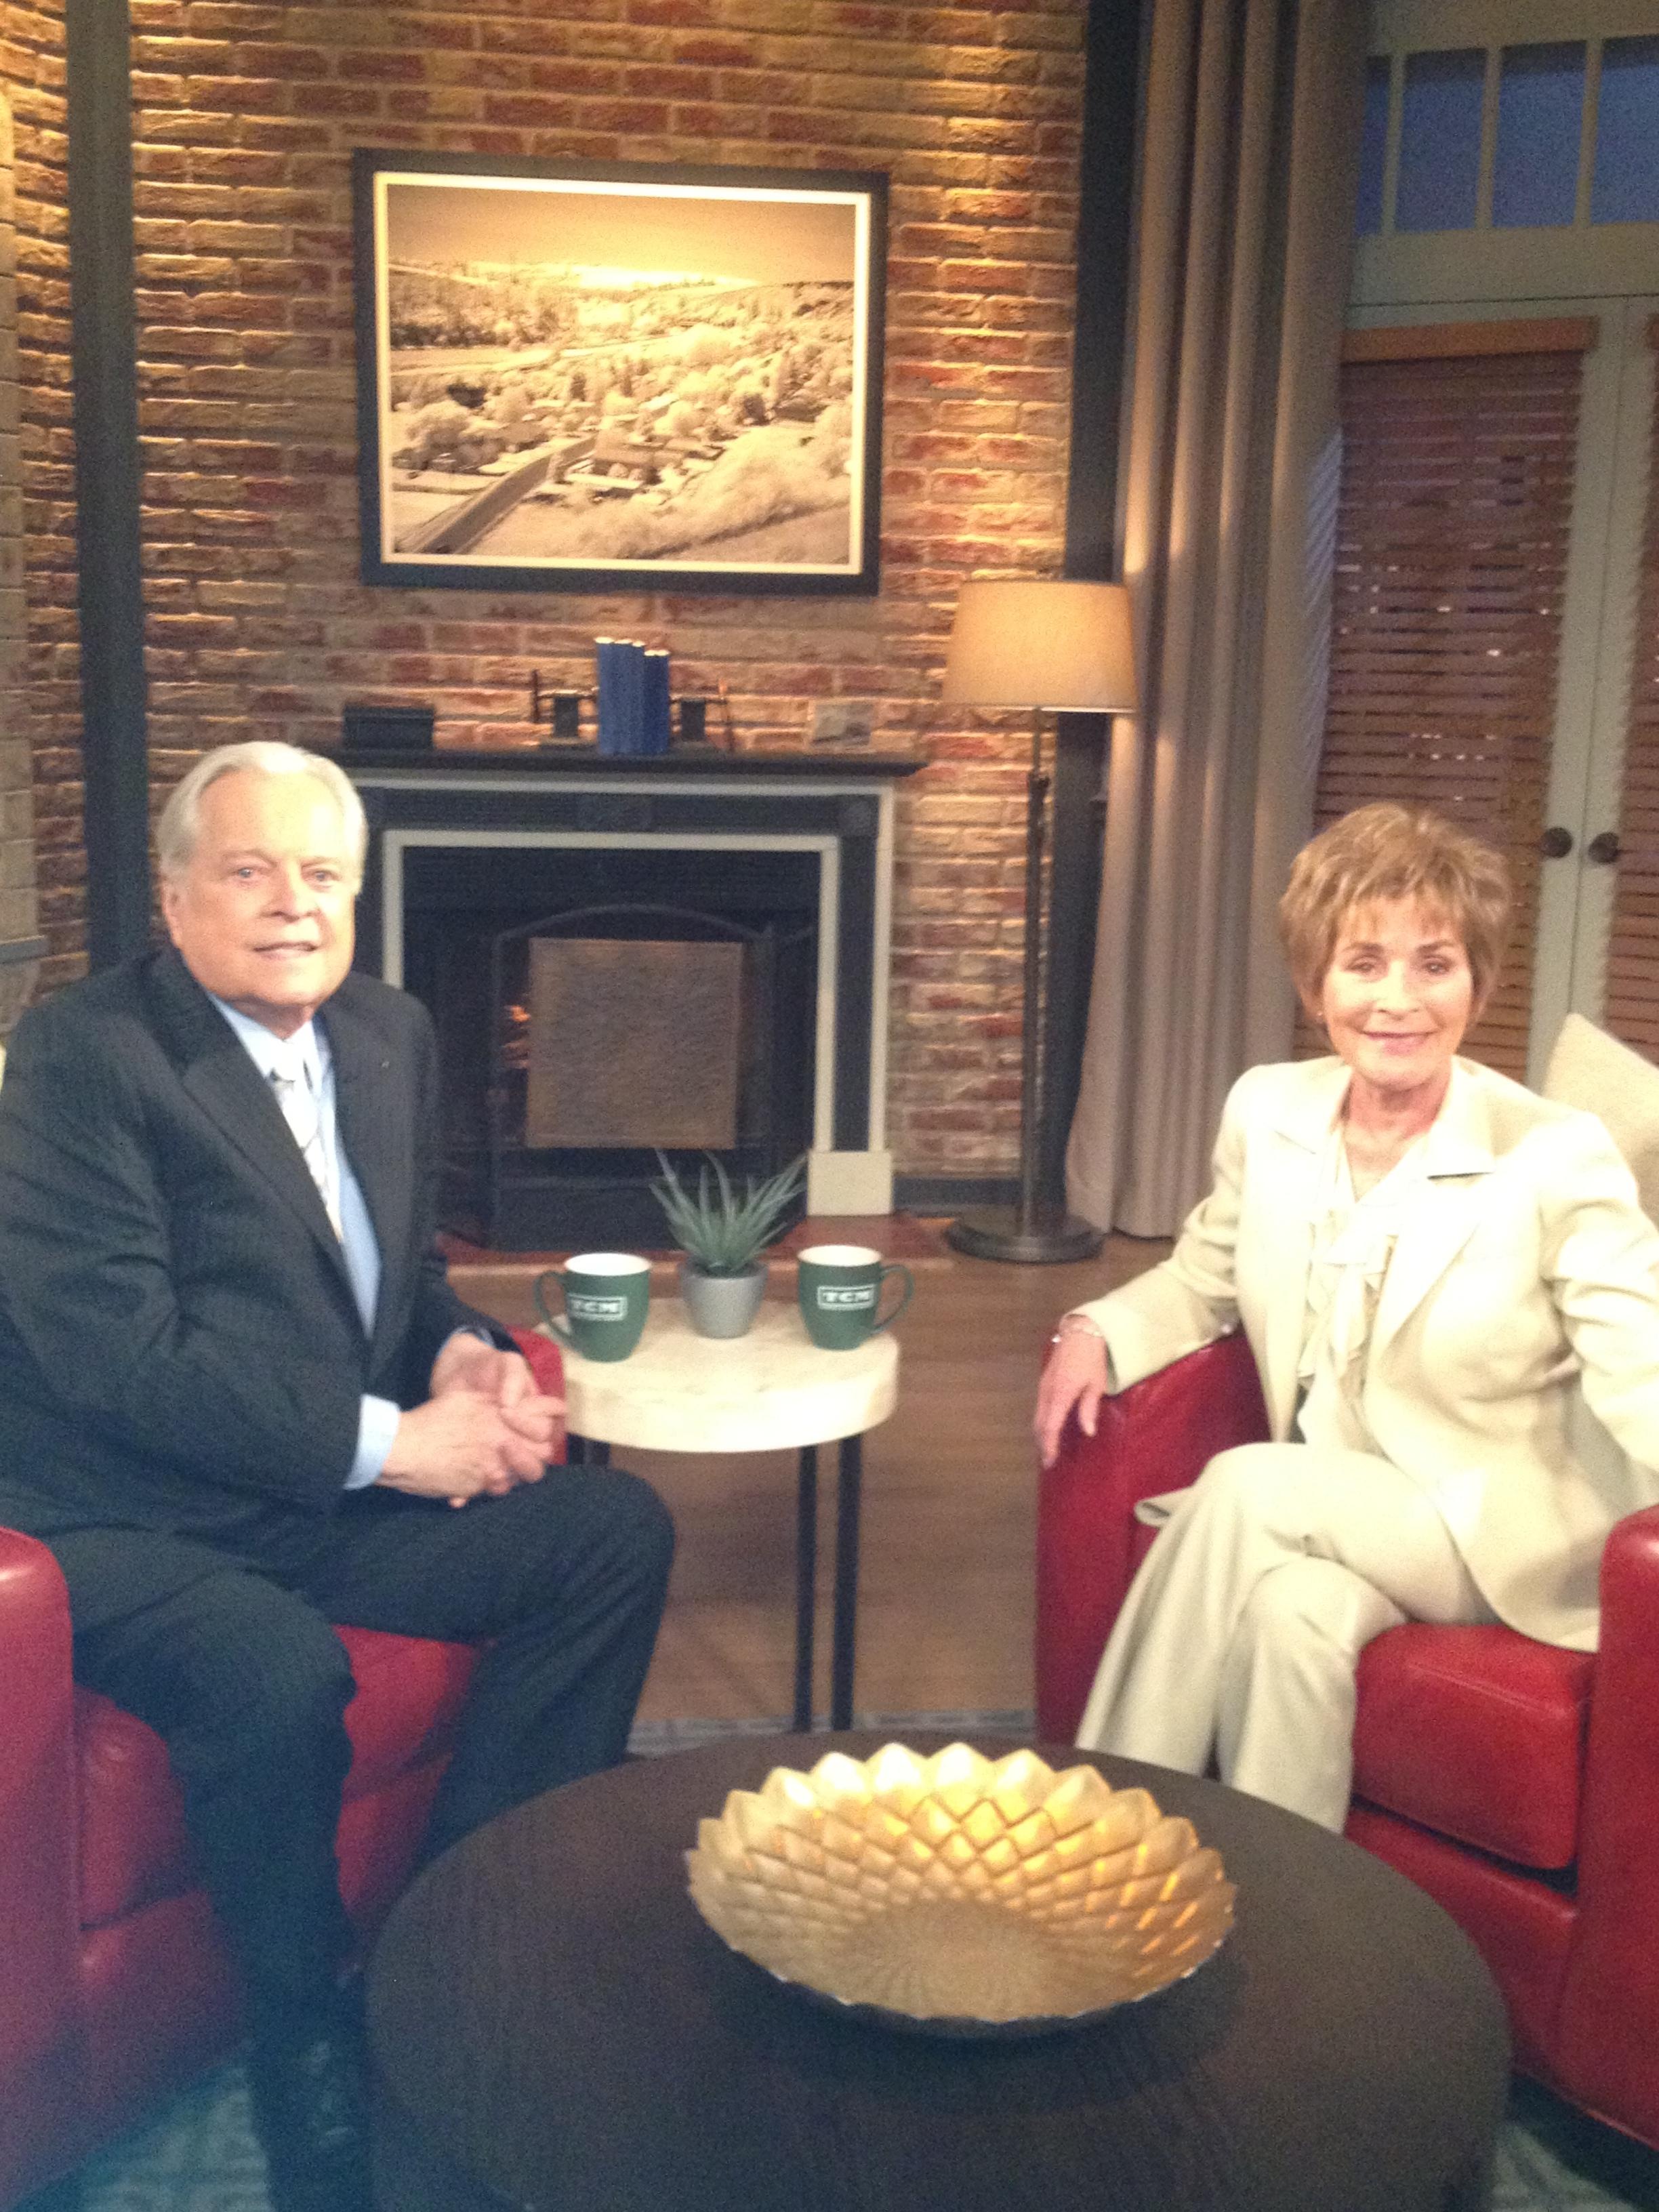 Judge Judy with Robert Osbourne